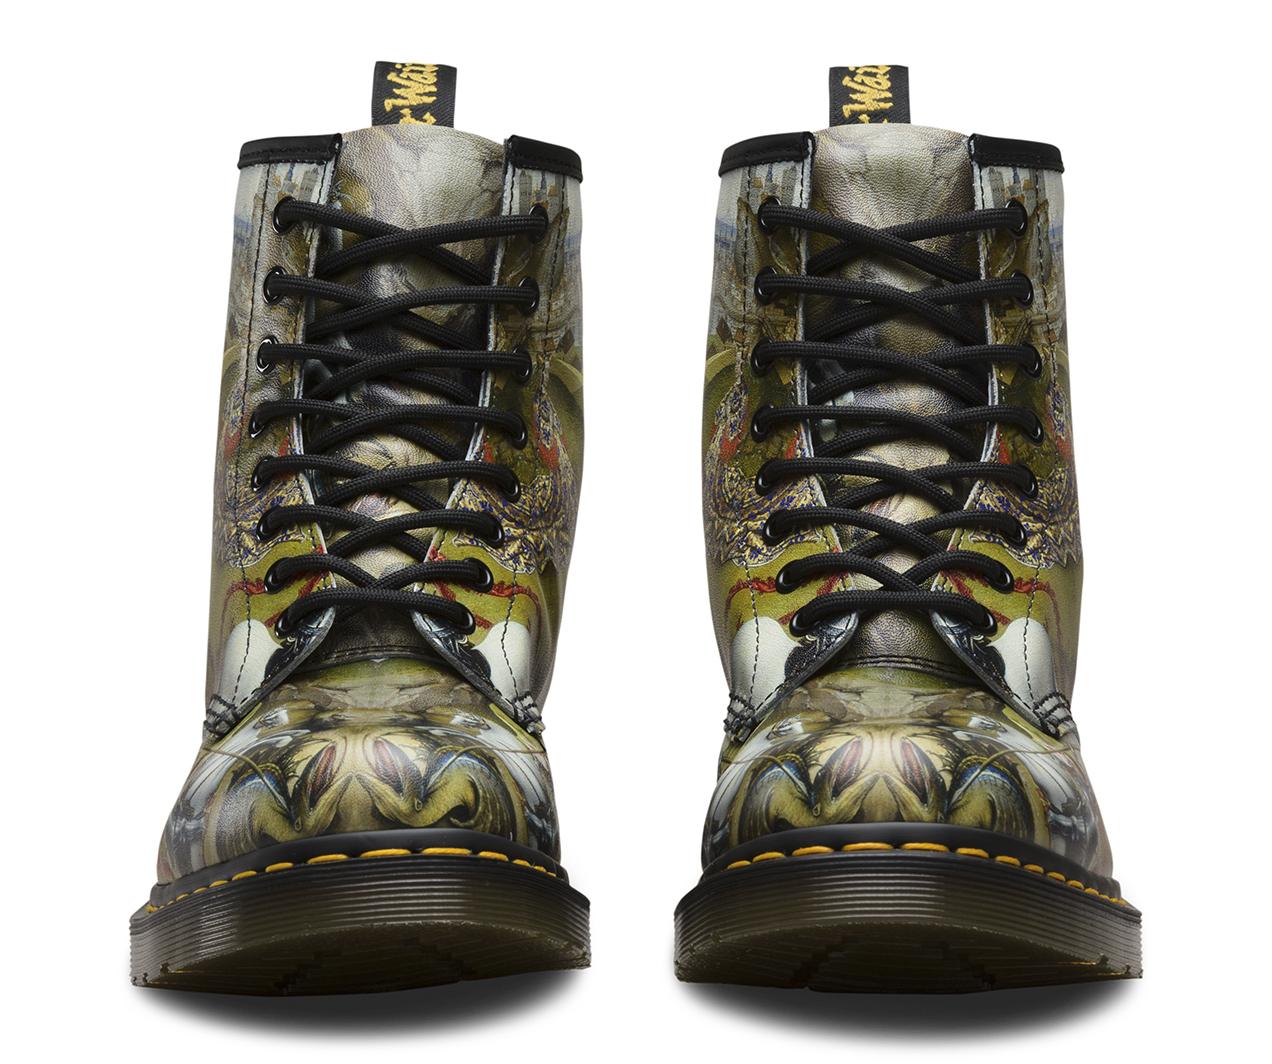 Dr. Martens 1460 Multi George & Dragon Backhand 22432102, Boots - 40 EU